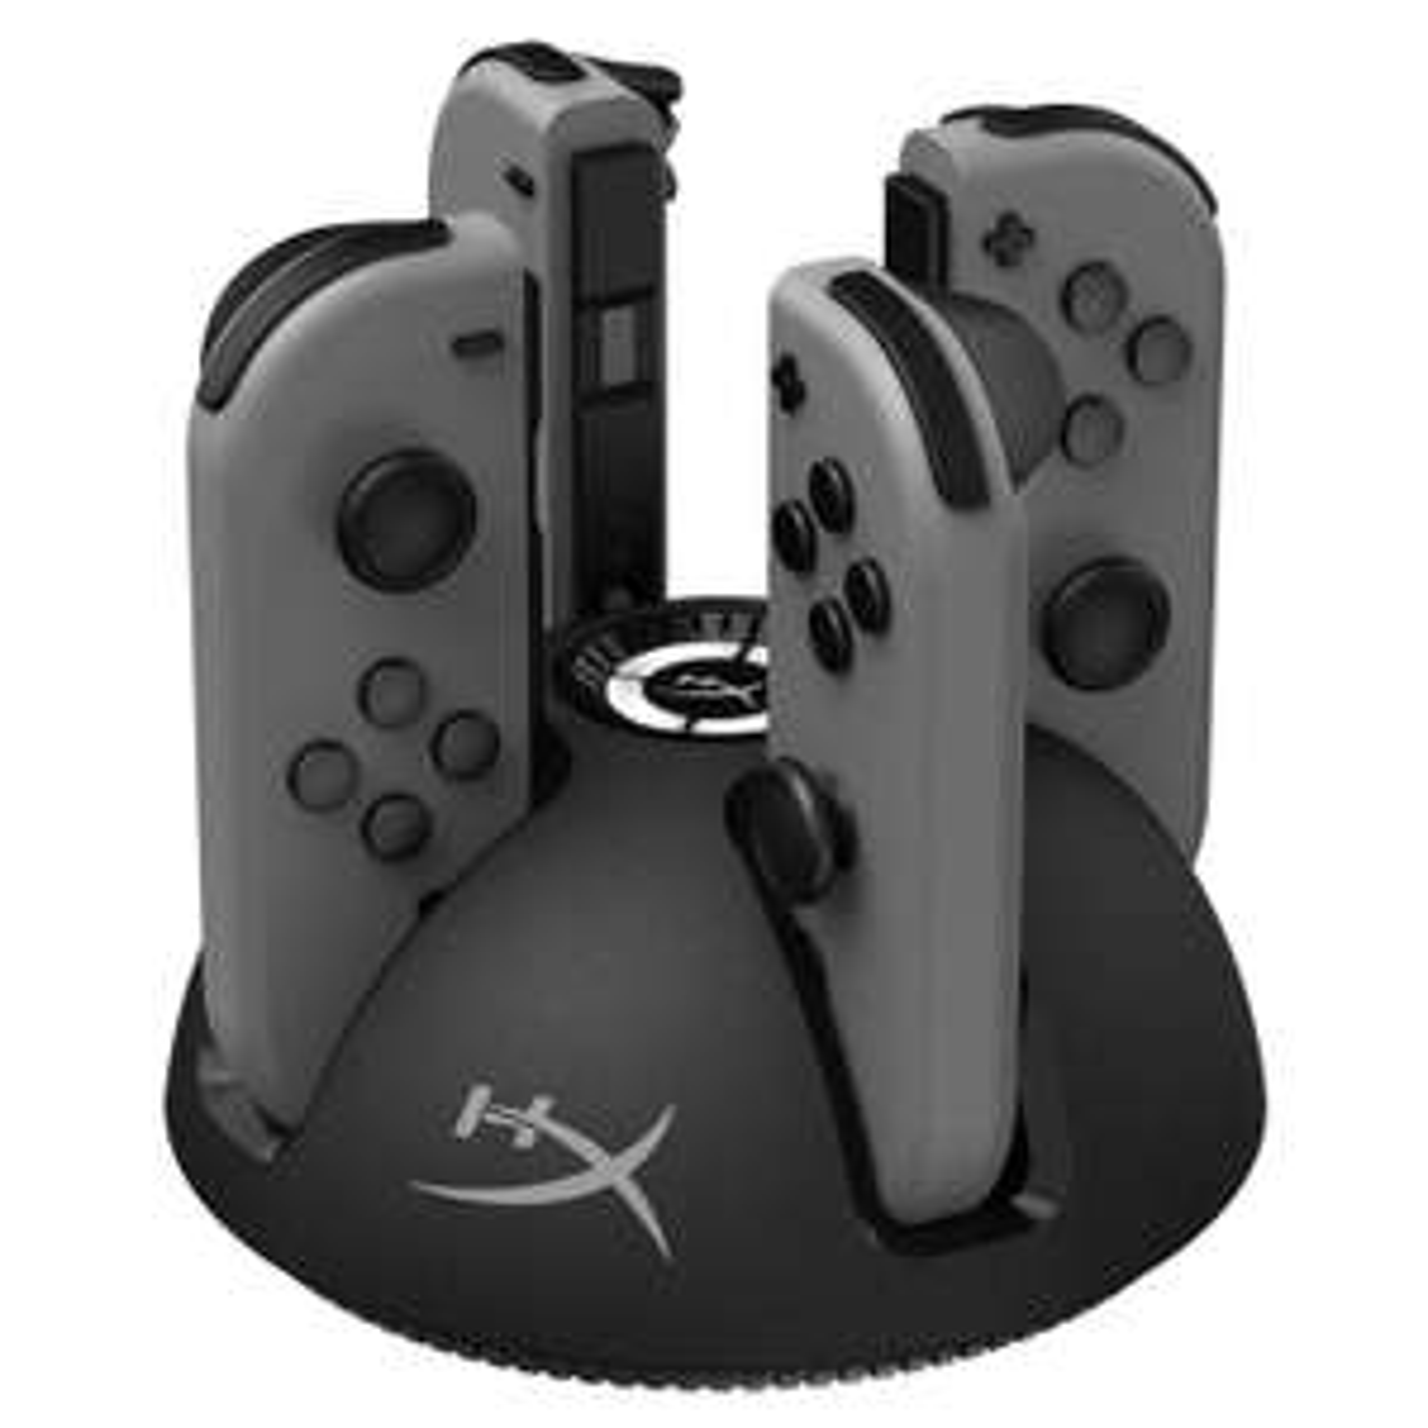 Nintendo switch HyperX HX-CPQD-U Chargeplay Quad - Joy-con Charging Station £12.74 (+£4.49 Non Prime) @ Amazon